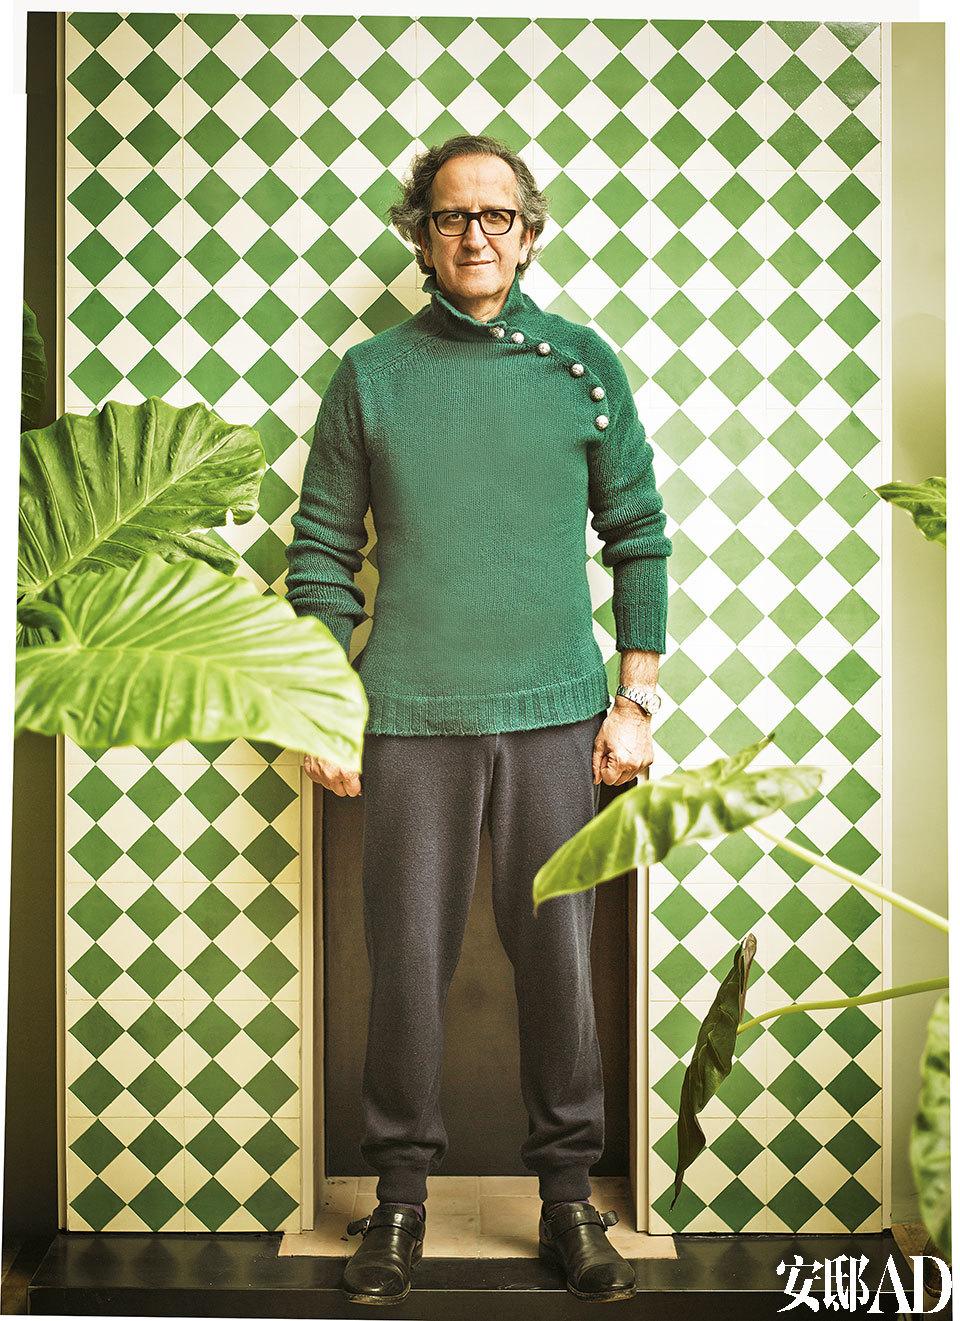 Jaime Lacasa,这栋公寓的设计者,2002年他创办了自己的男装品牌Scooter,在广告界和电影界开展了多项合作。几年前,他开创了名为 Scooter Design的建筑设计公司,许多新式住宅、精品店和饭店里都留下了他的设计痕迹。